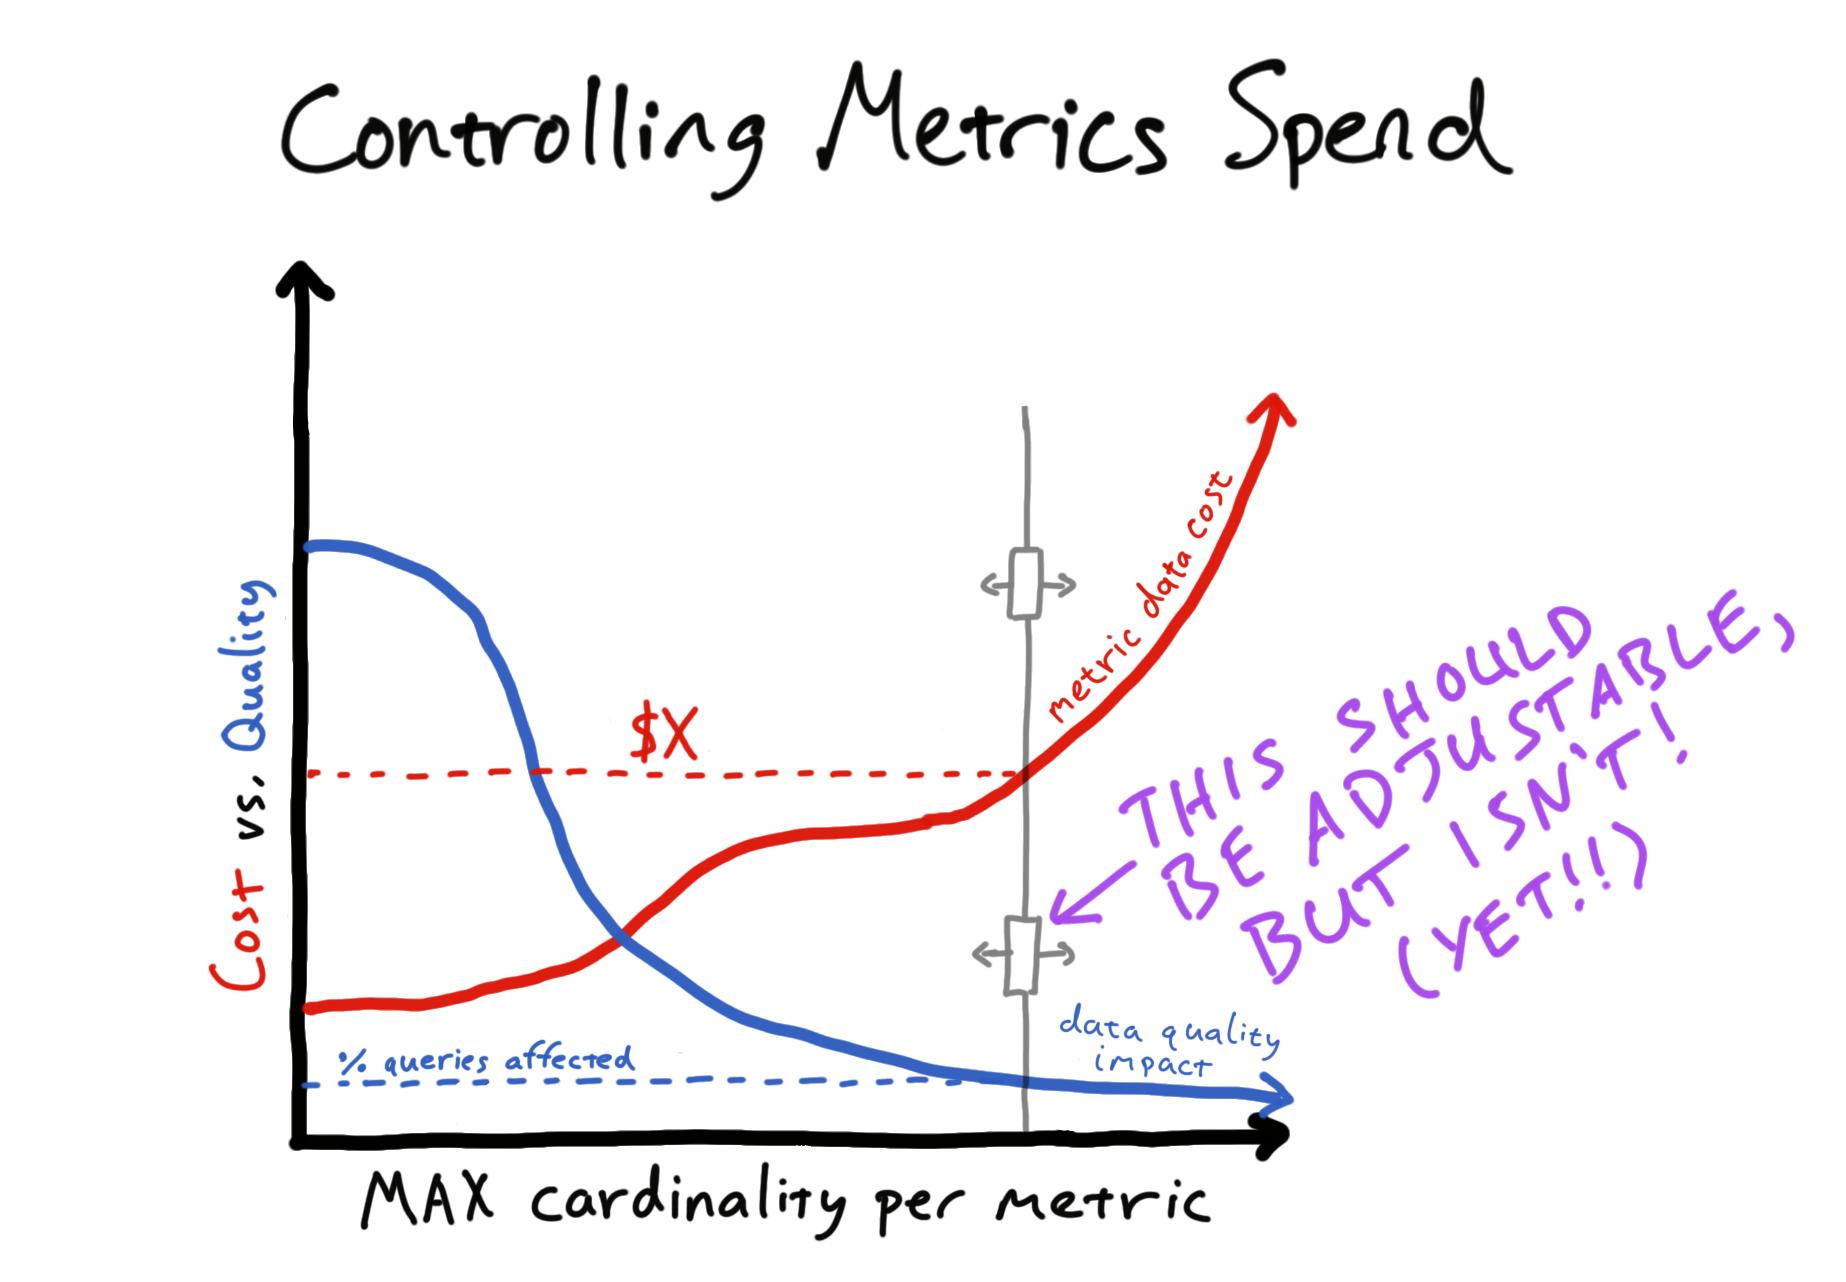 Controlling Metrics Spend